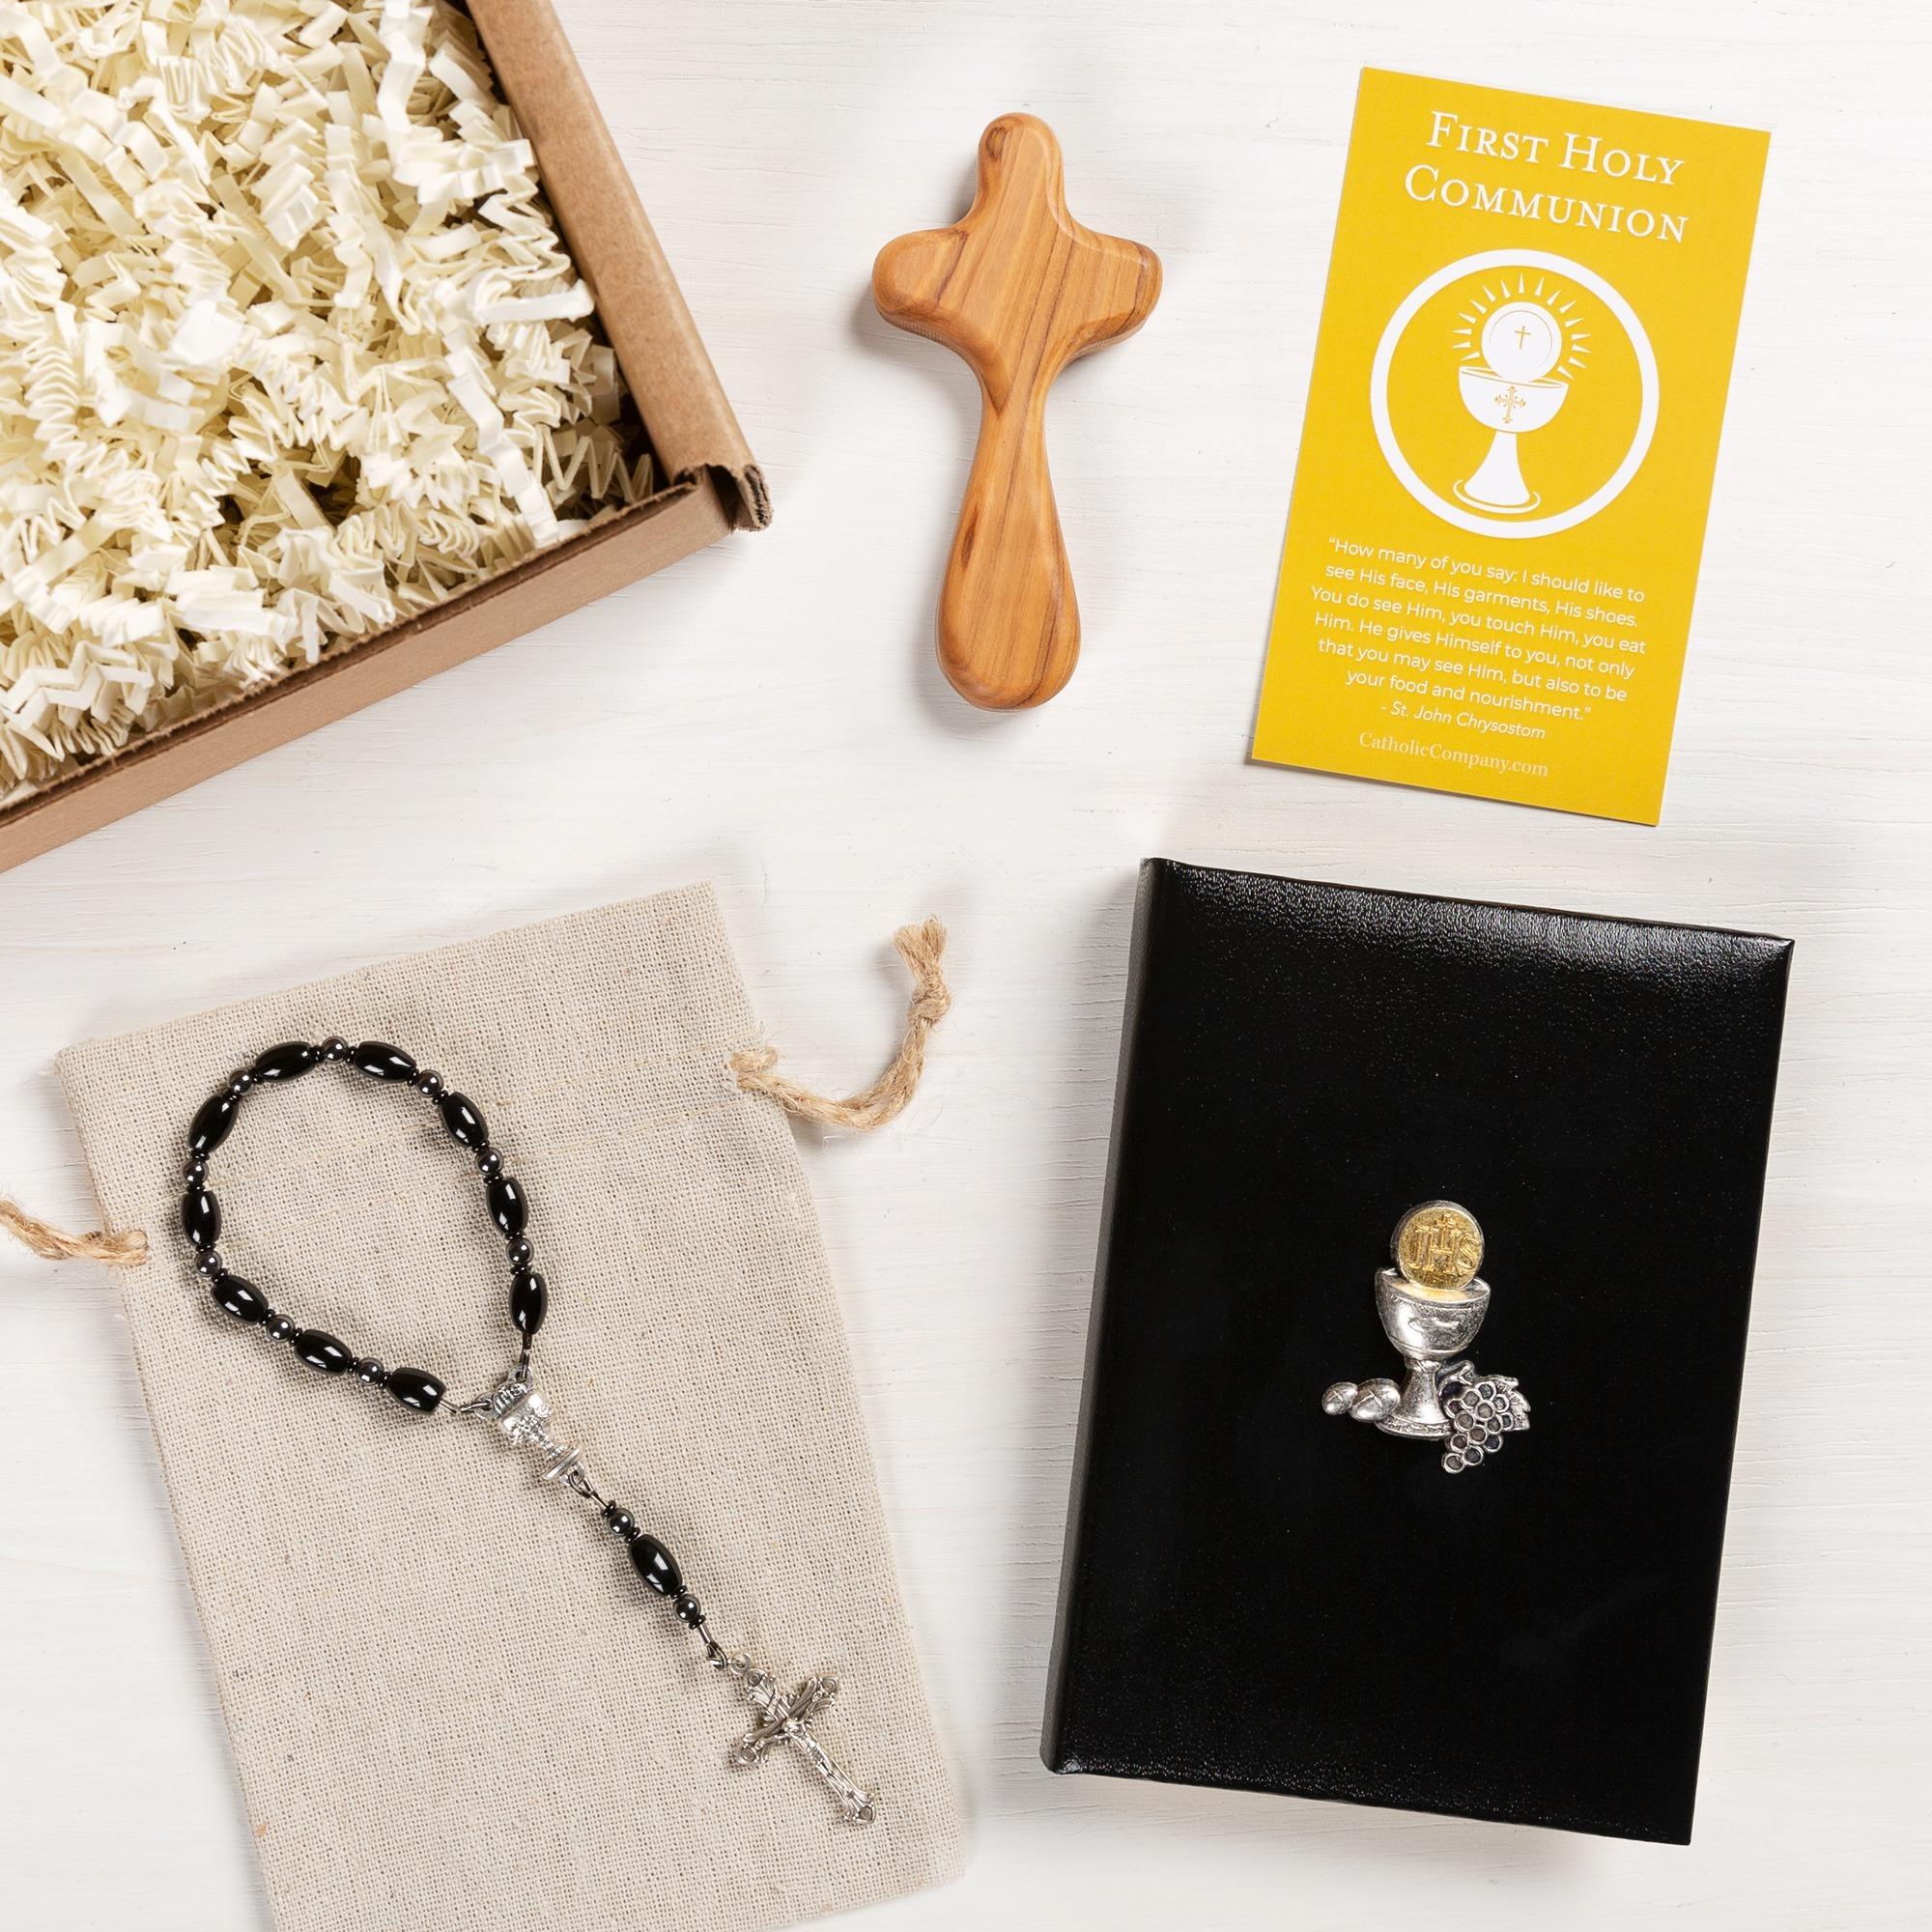 First Communion Gift Box Set